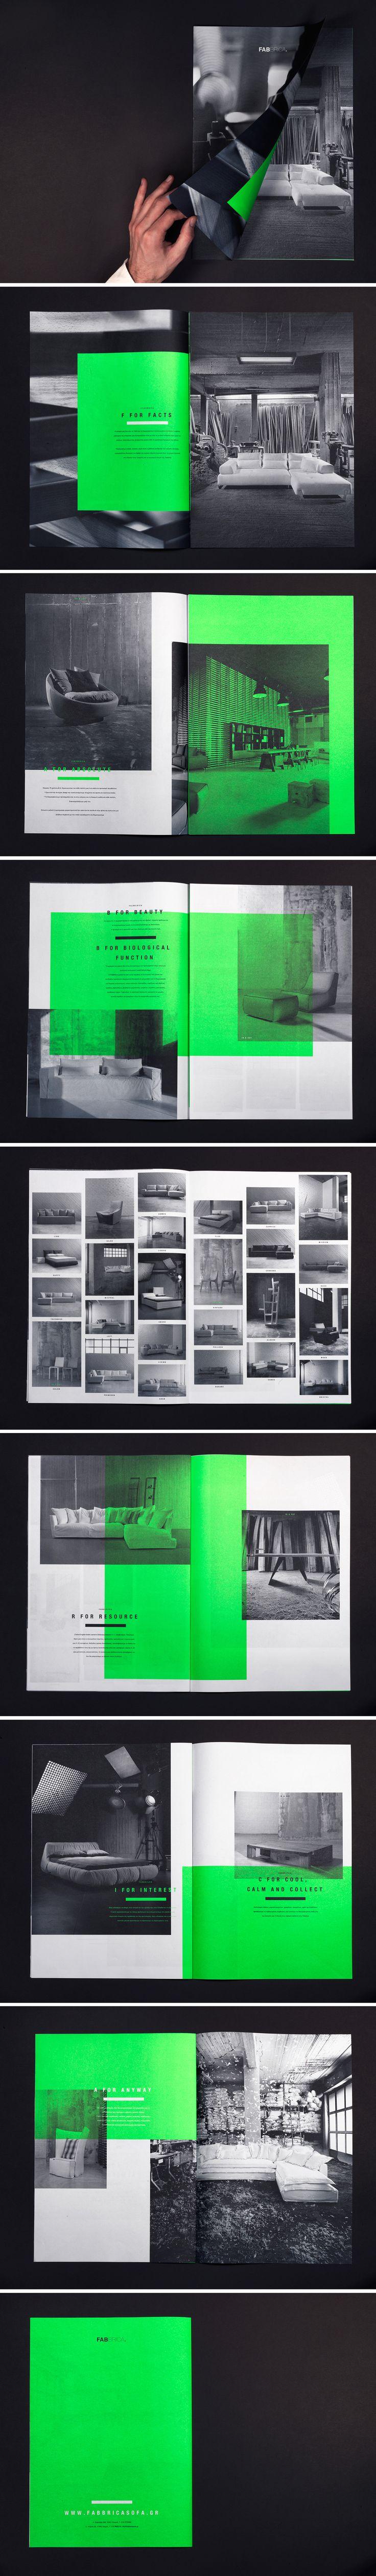 Fabrica—tion / Joshua Olsthoorn